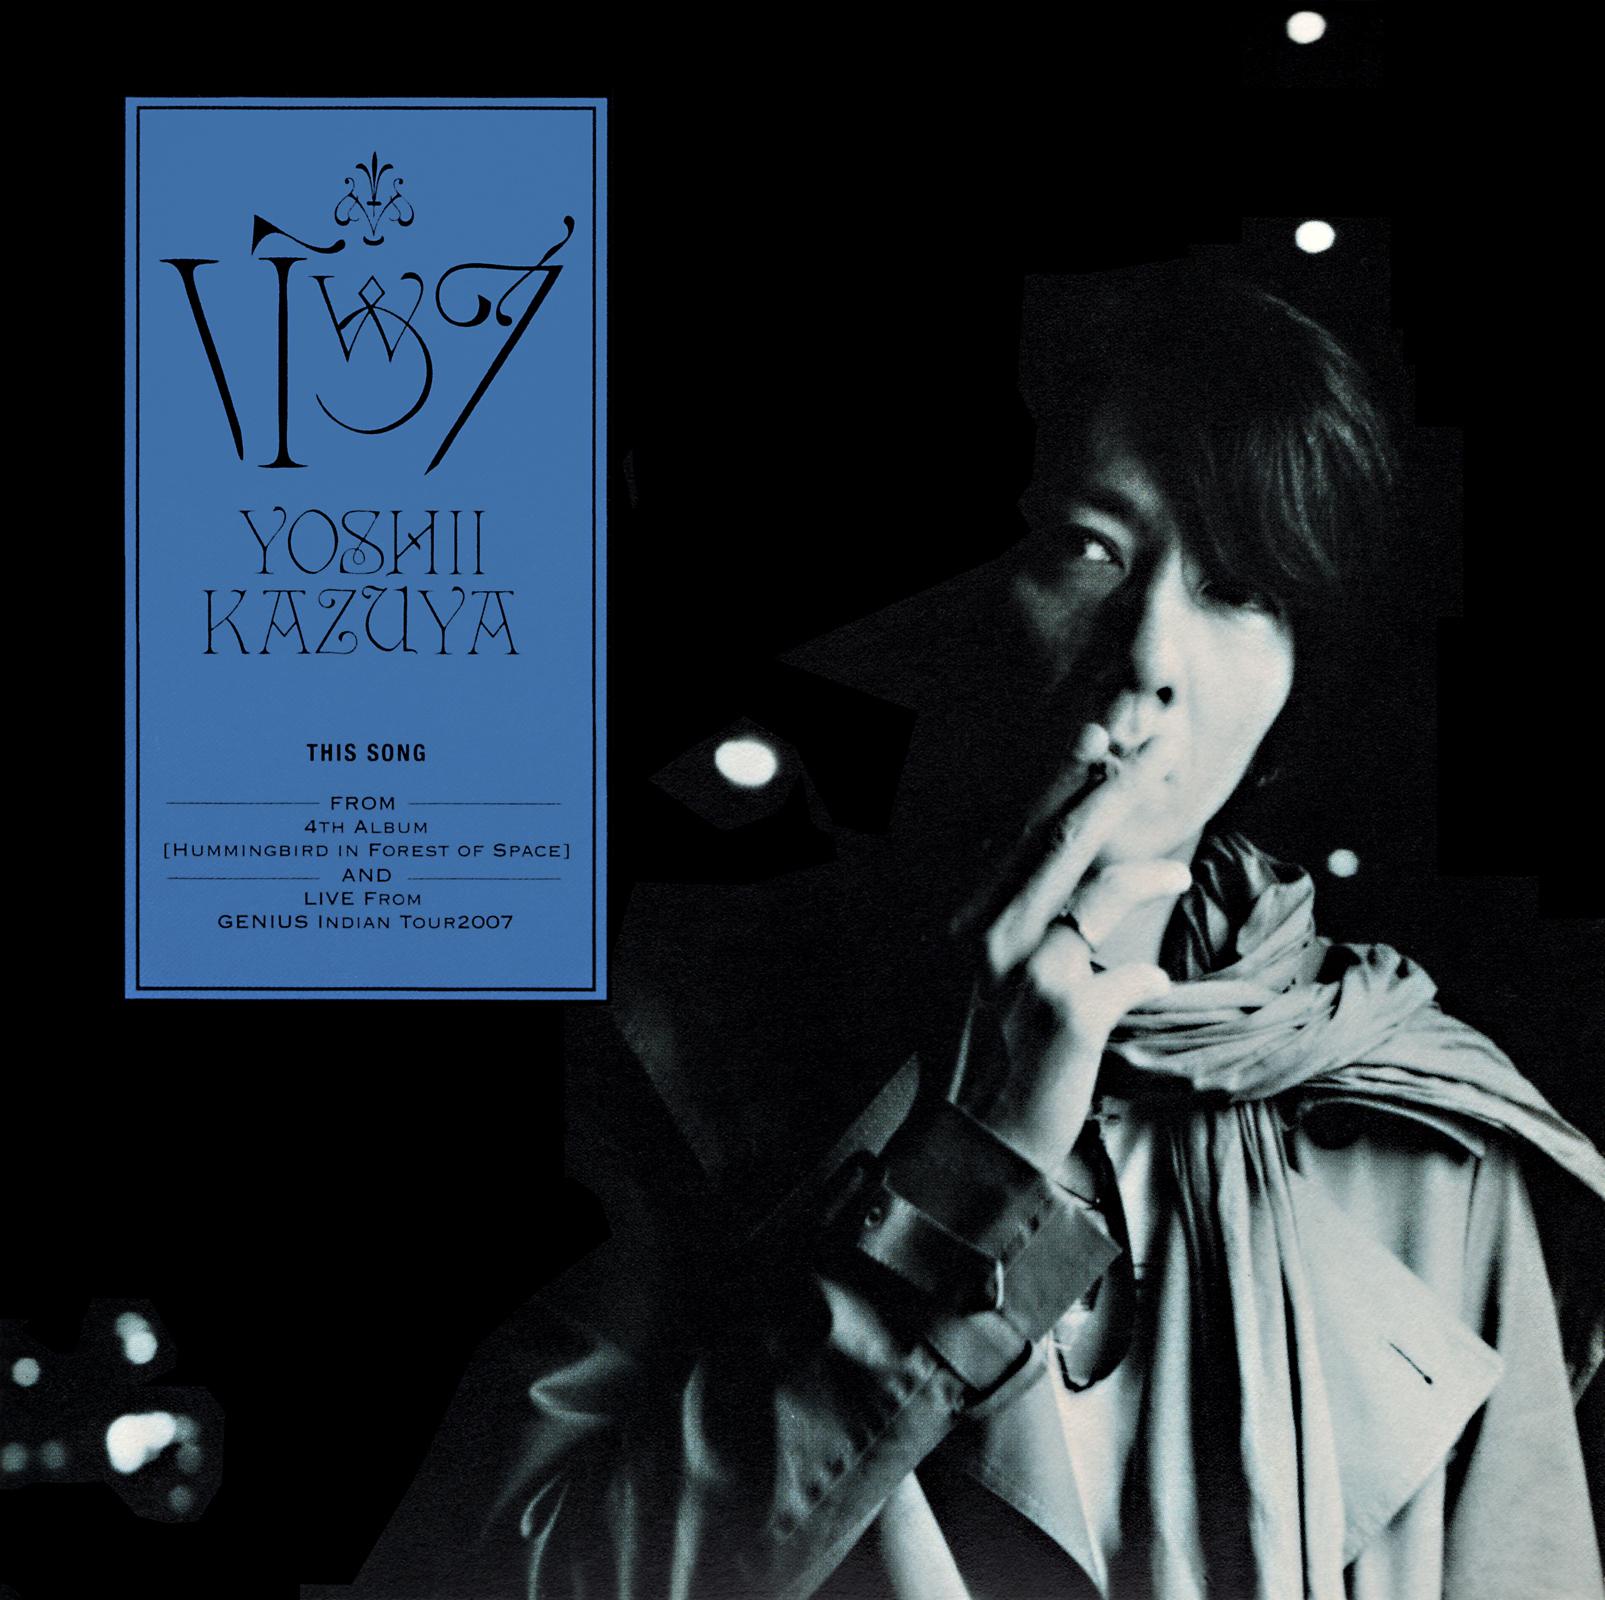 Kazuya Yoshii Yoshii Lovinson White Room